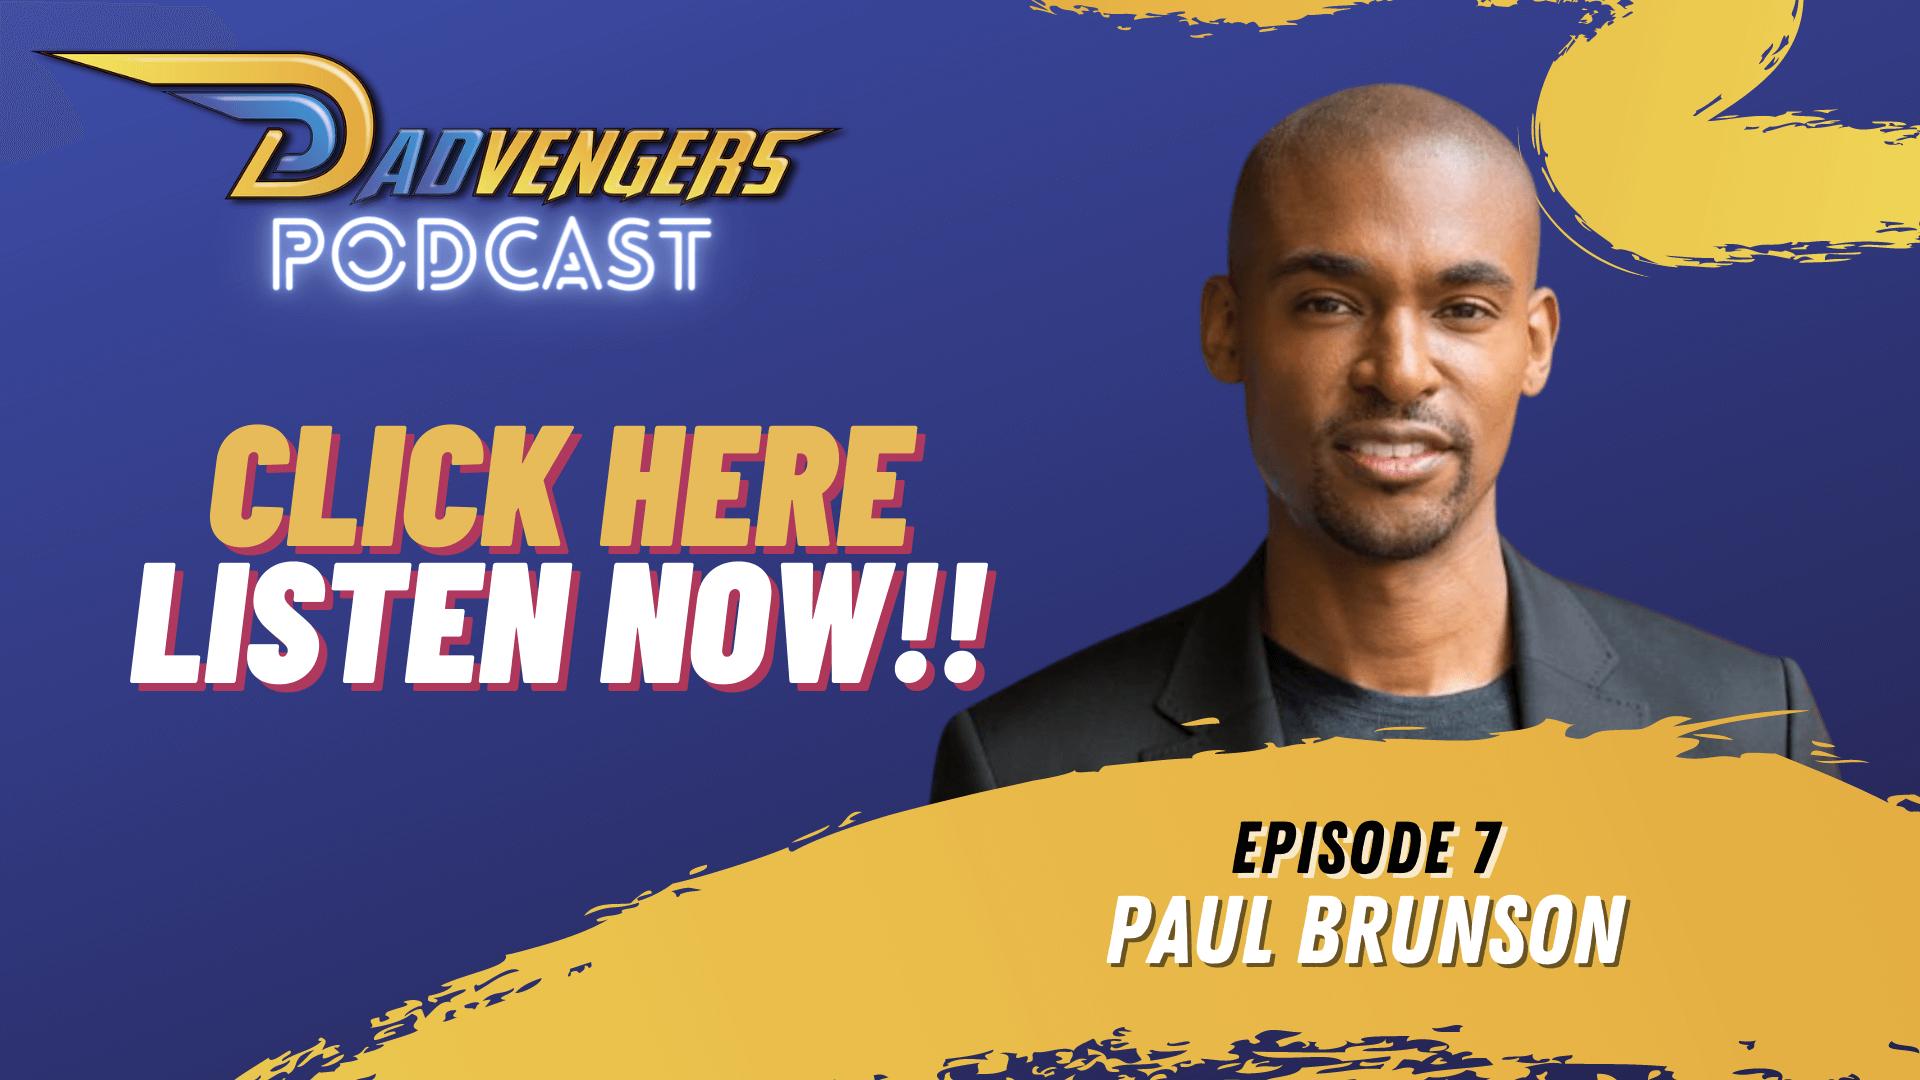 Podcast Ep 7 - Paul Brunson Webslider 01 (1920x1080)